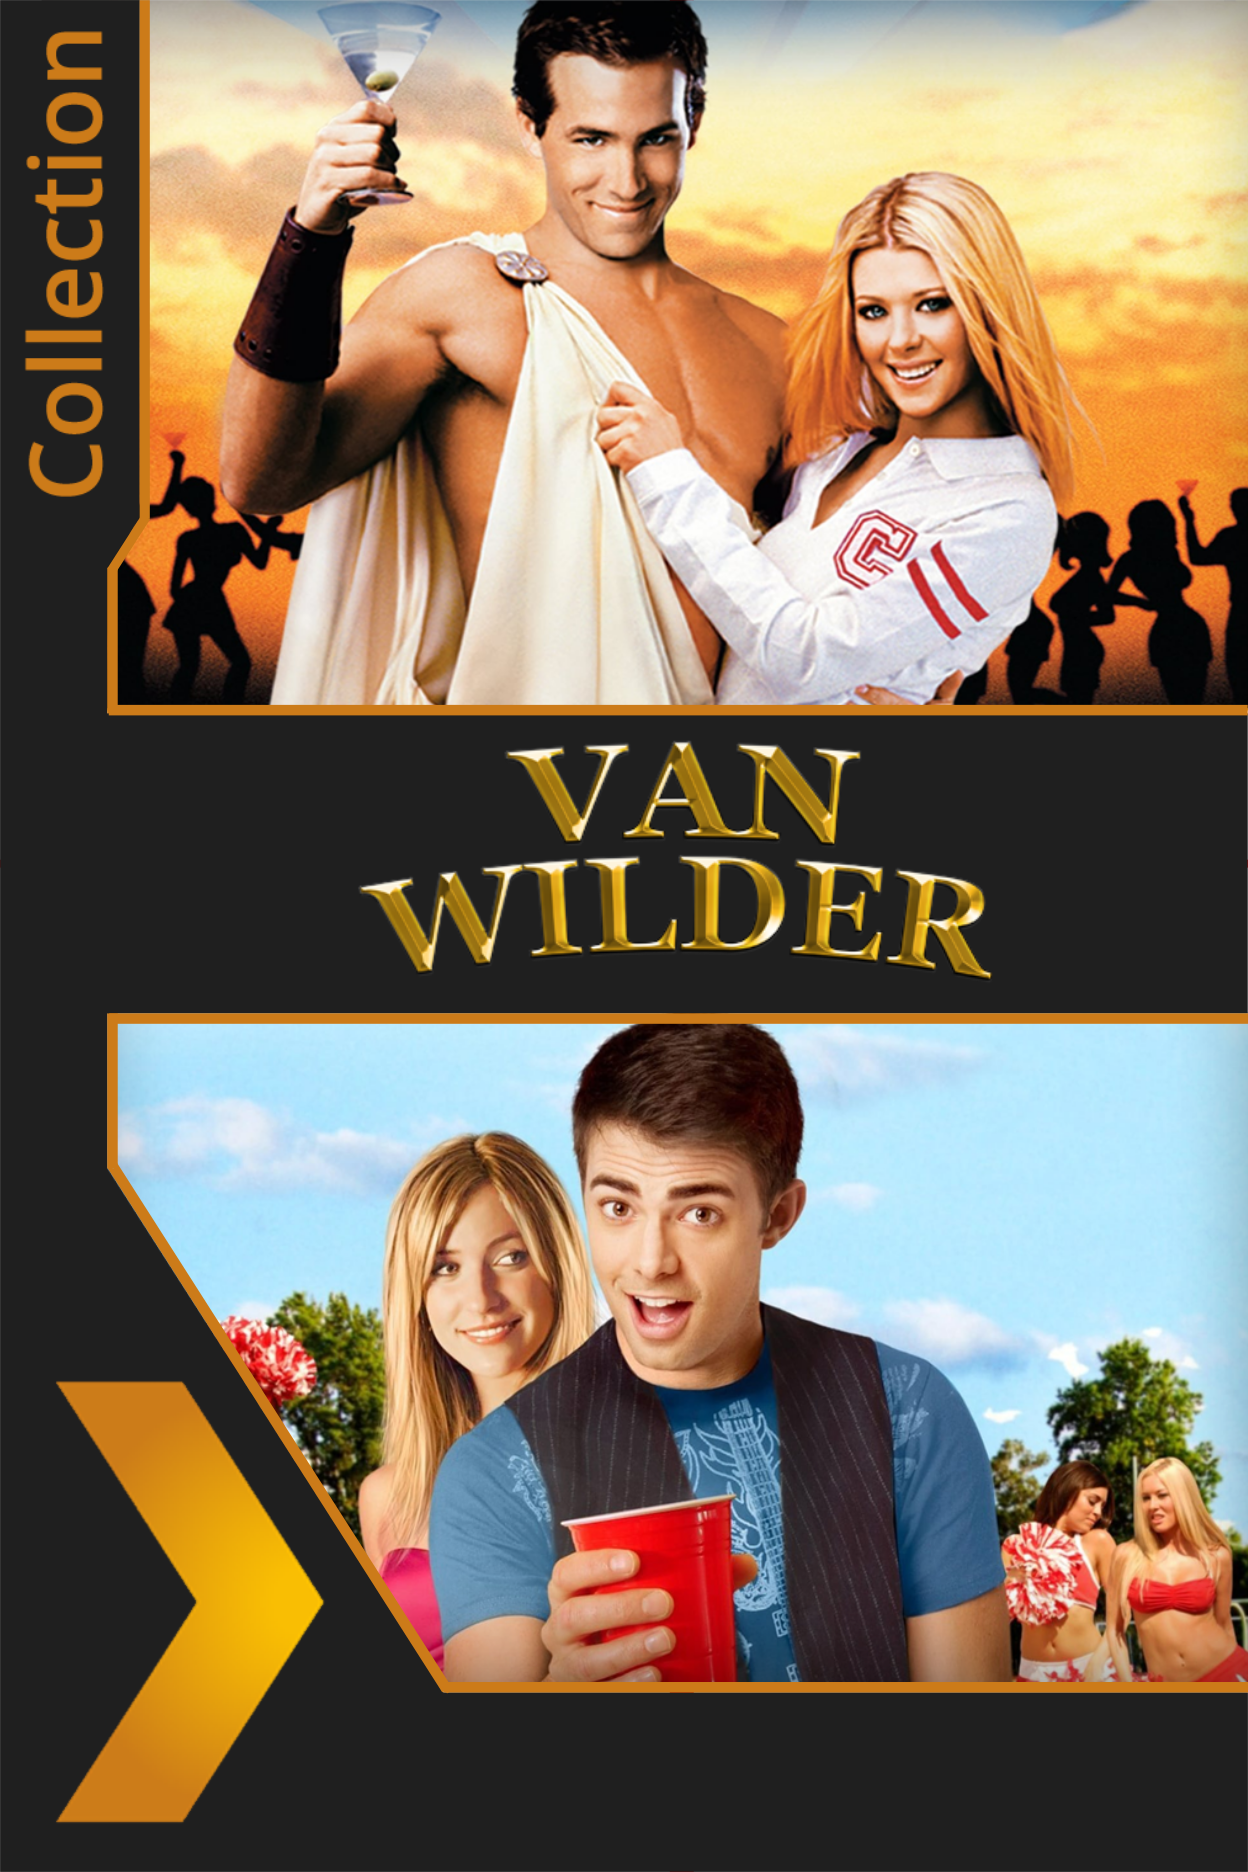 Plex Van Wilder Movies Movie Posters National Lampoons